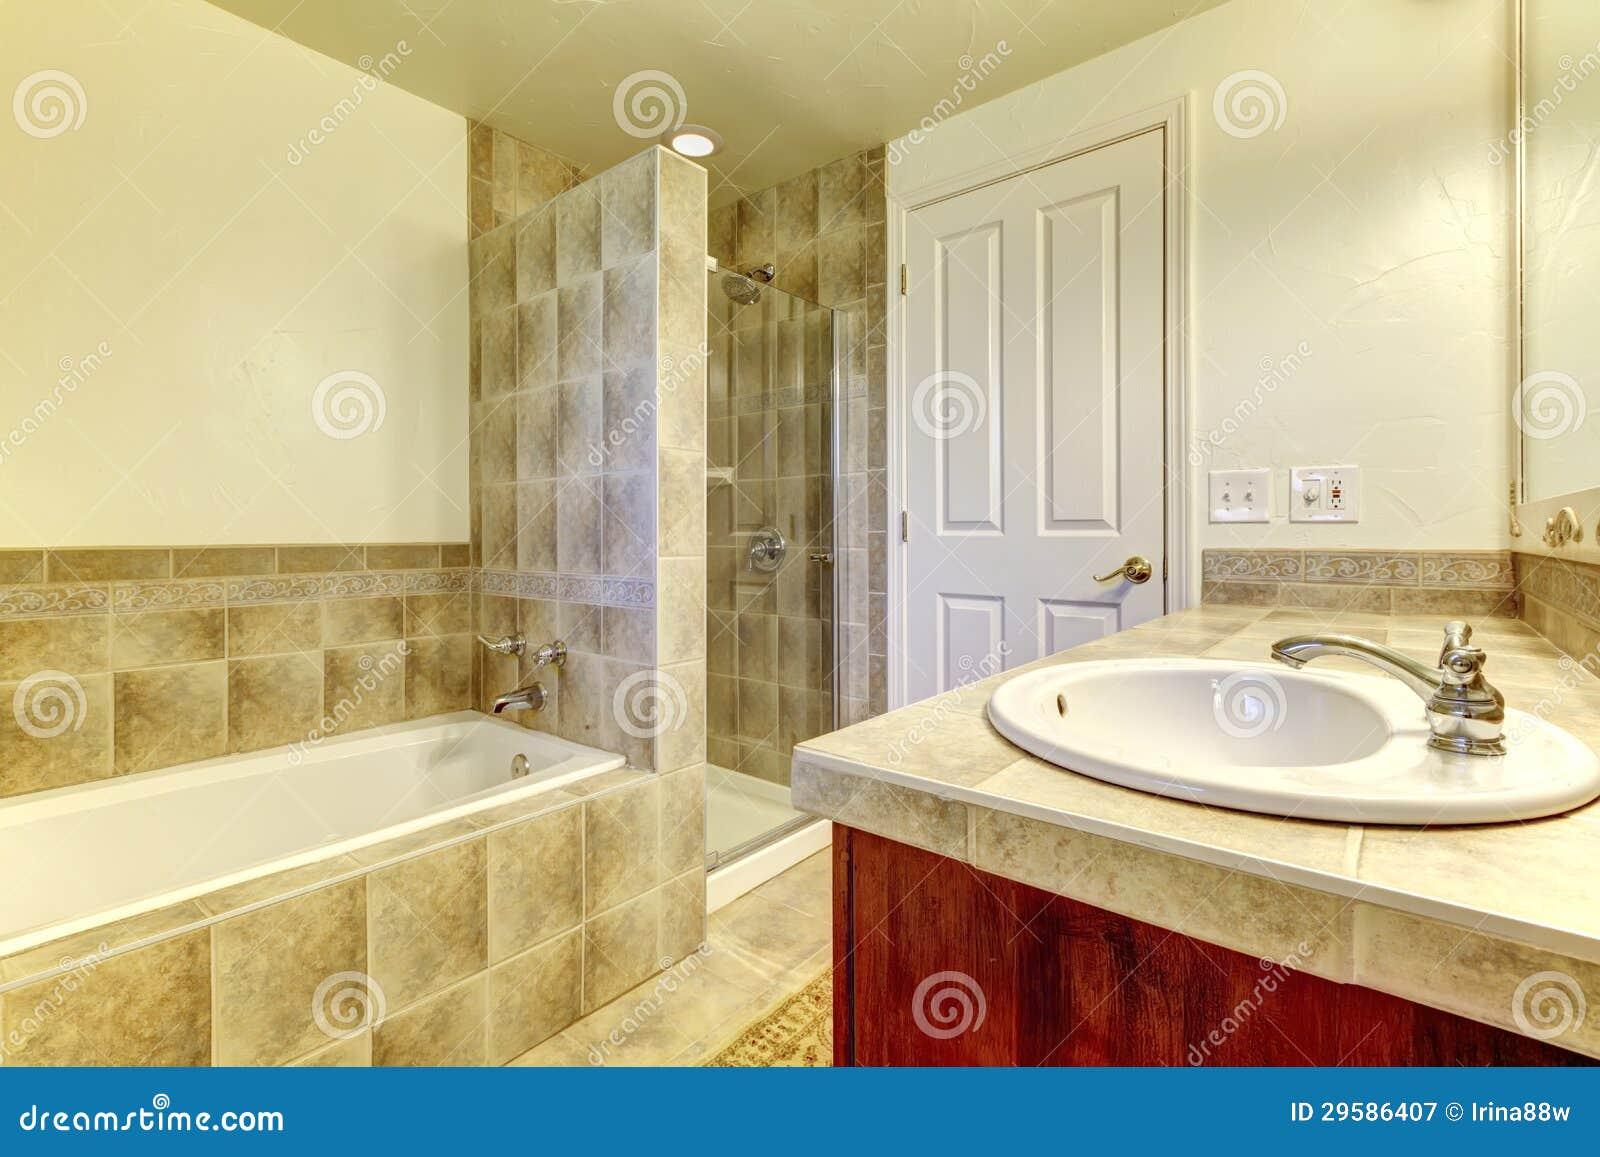 Tinas De Baño Con Ducha:Small Bathroom with Tub and Shower